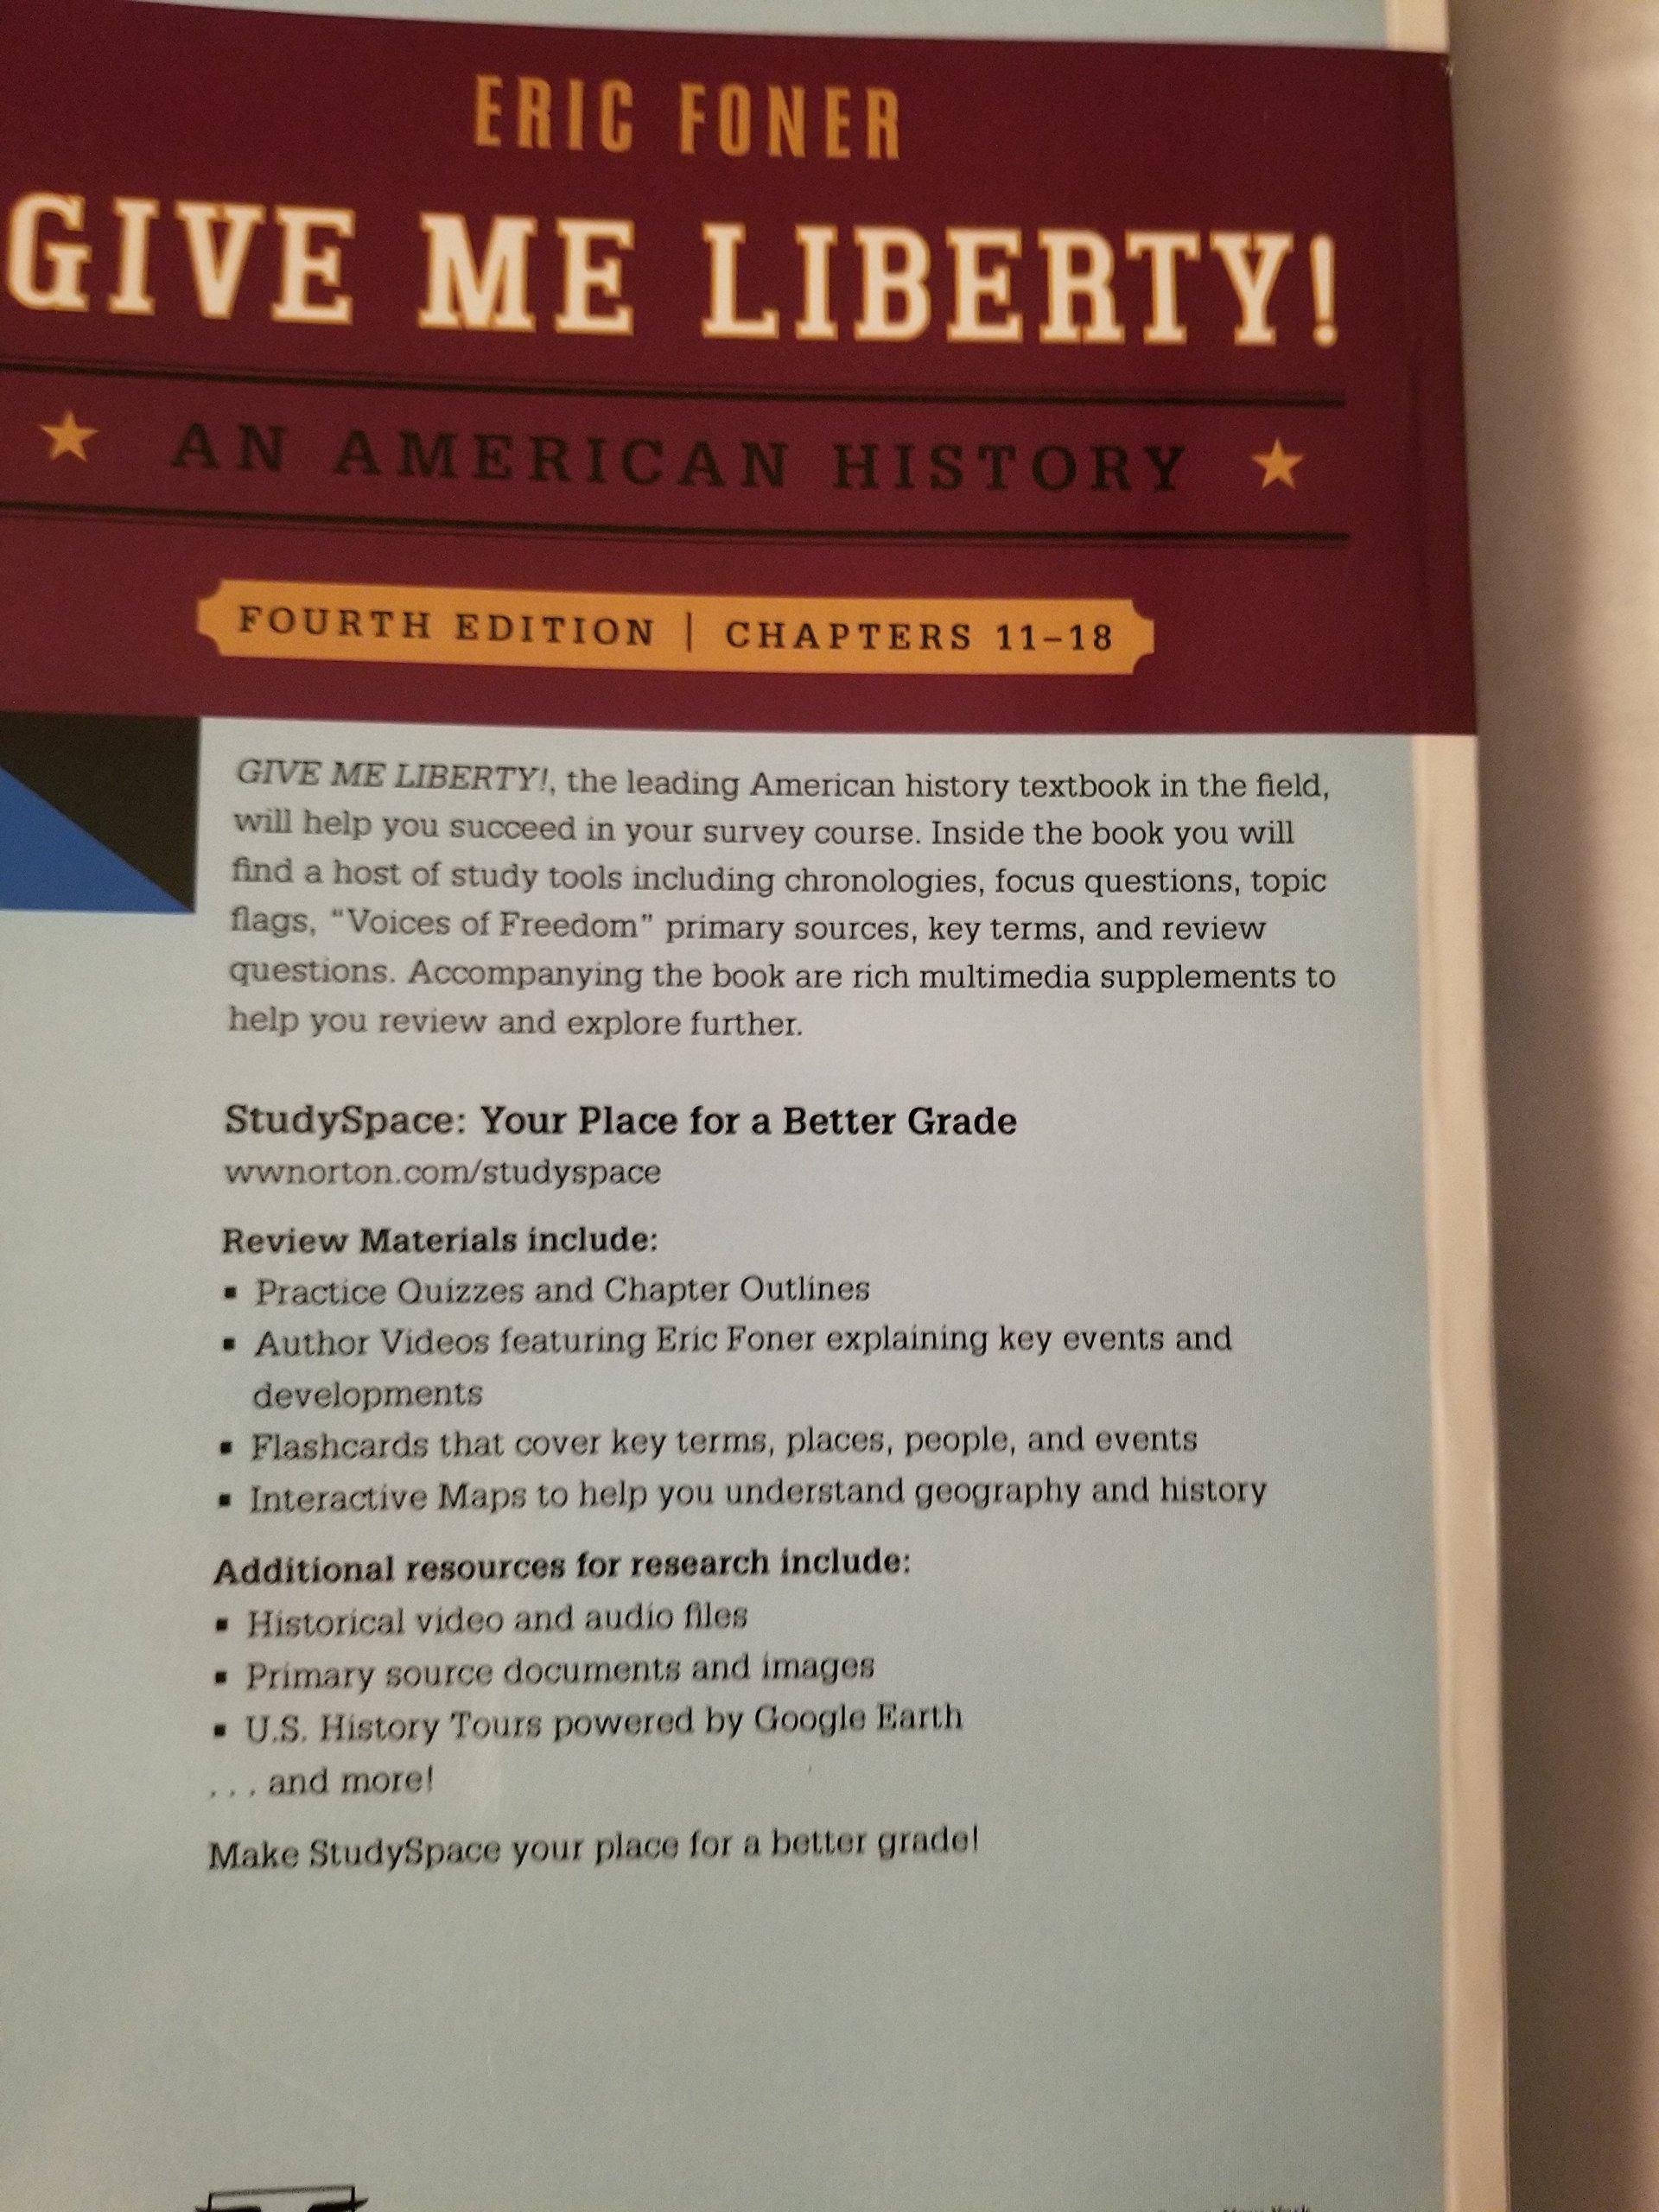 An American History Give me liberty: Eric Foner: 9780393250633: Amazon.com:  Books